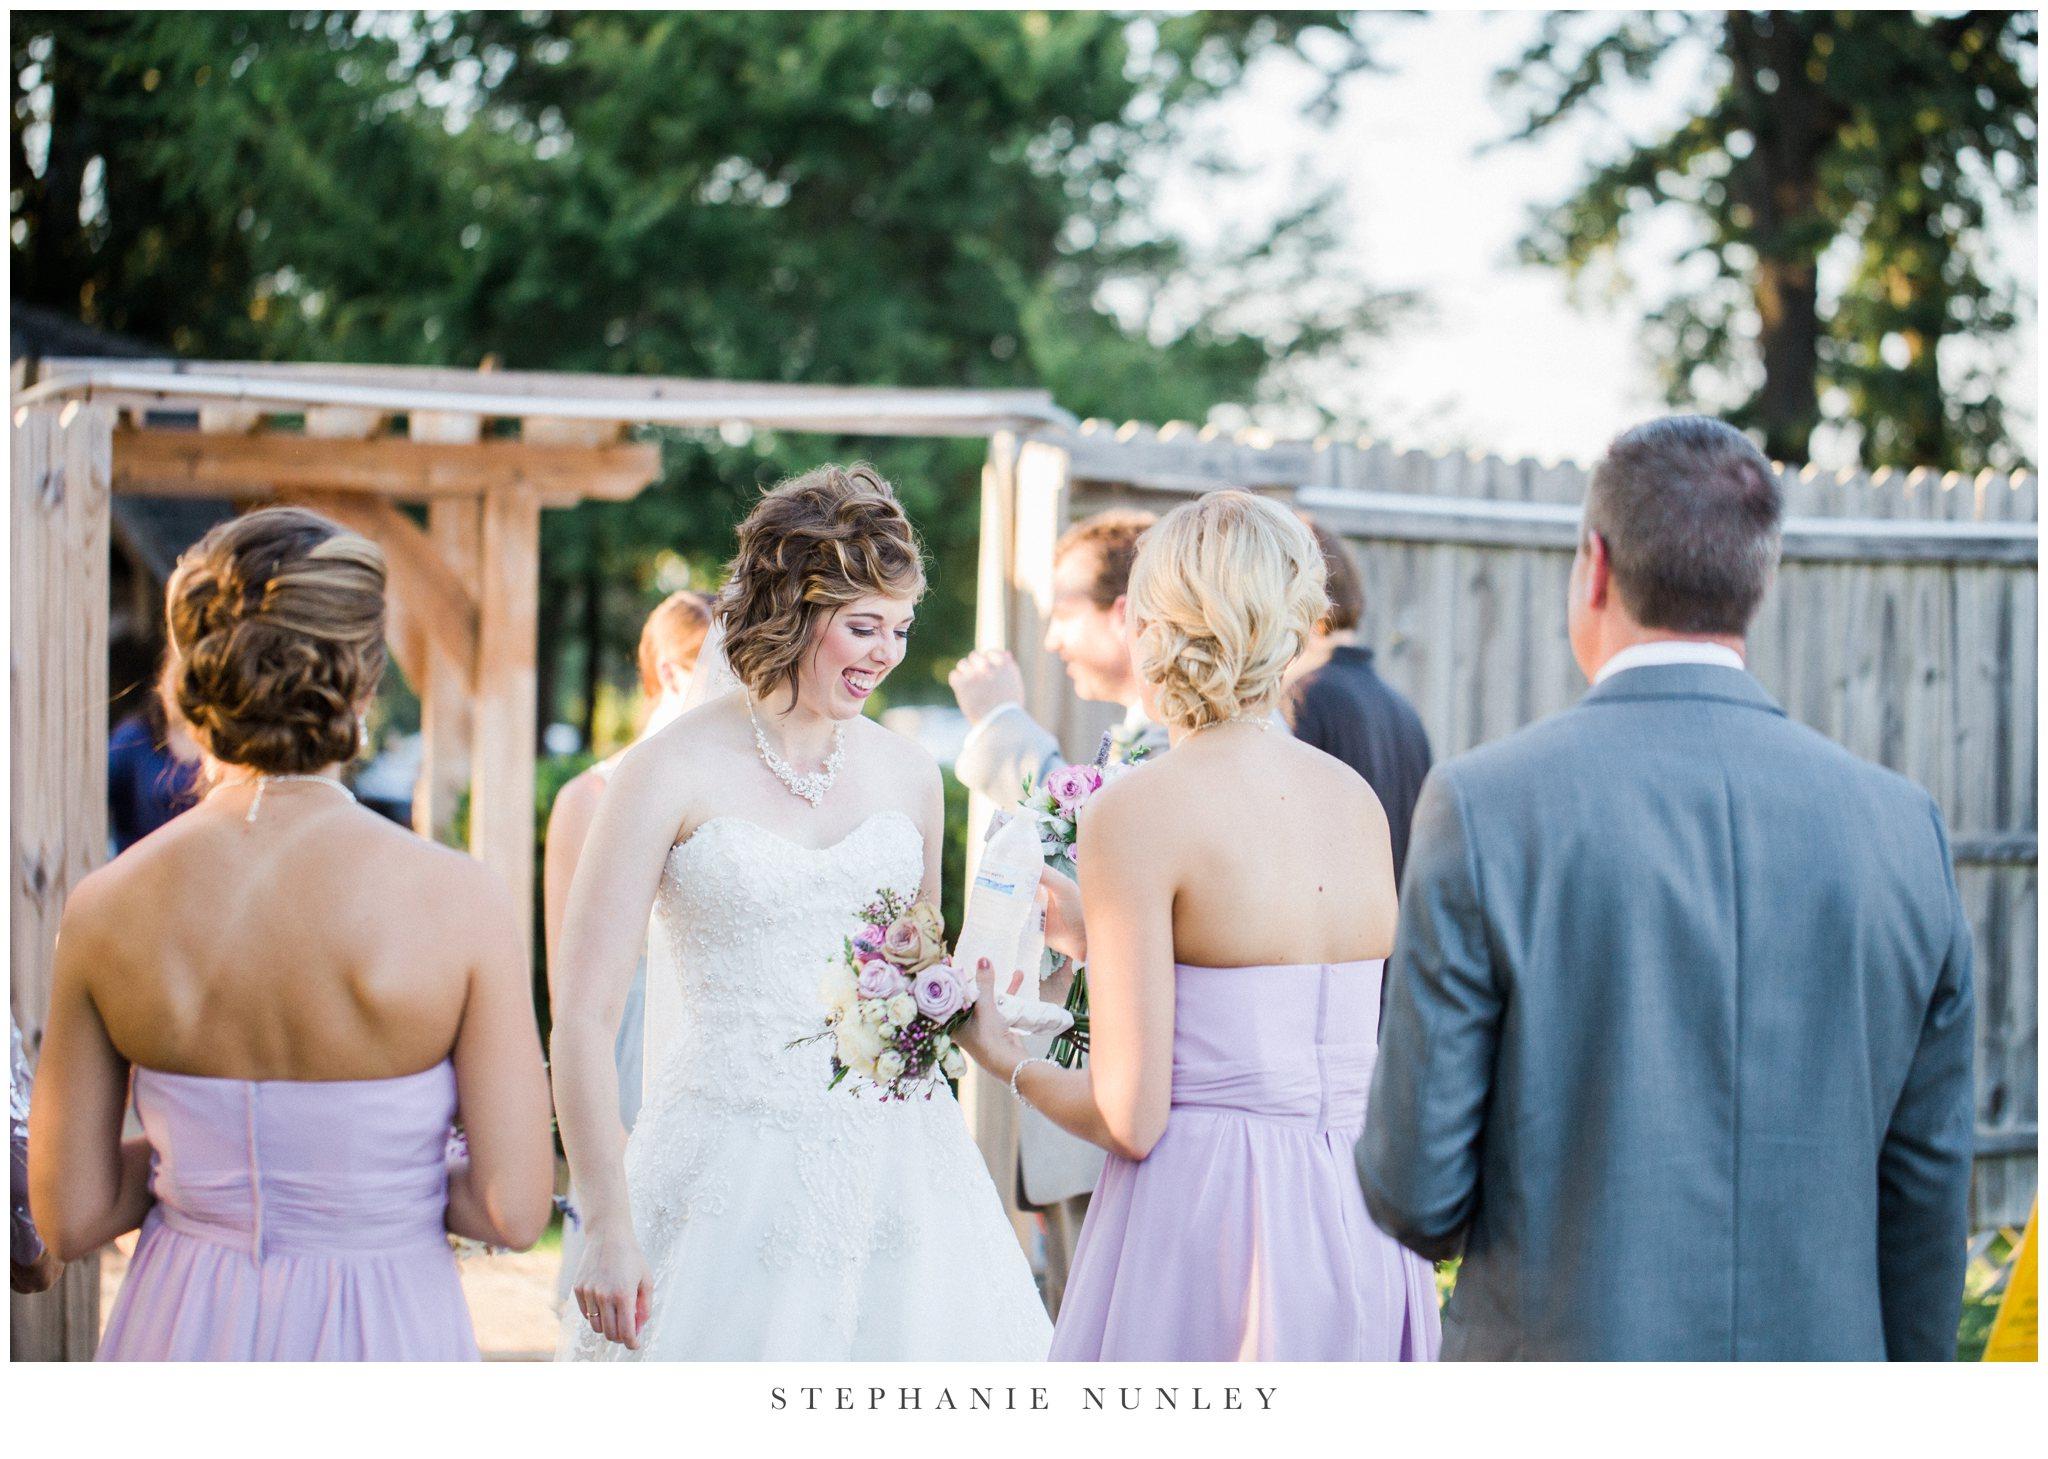 southern-classy-outdoor-barn-wedding-photos-0088.jpg